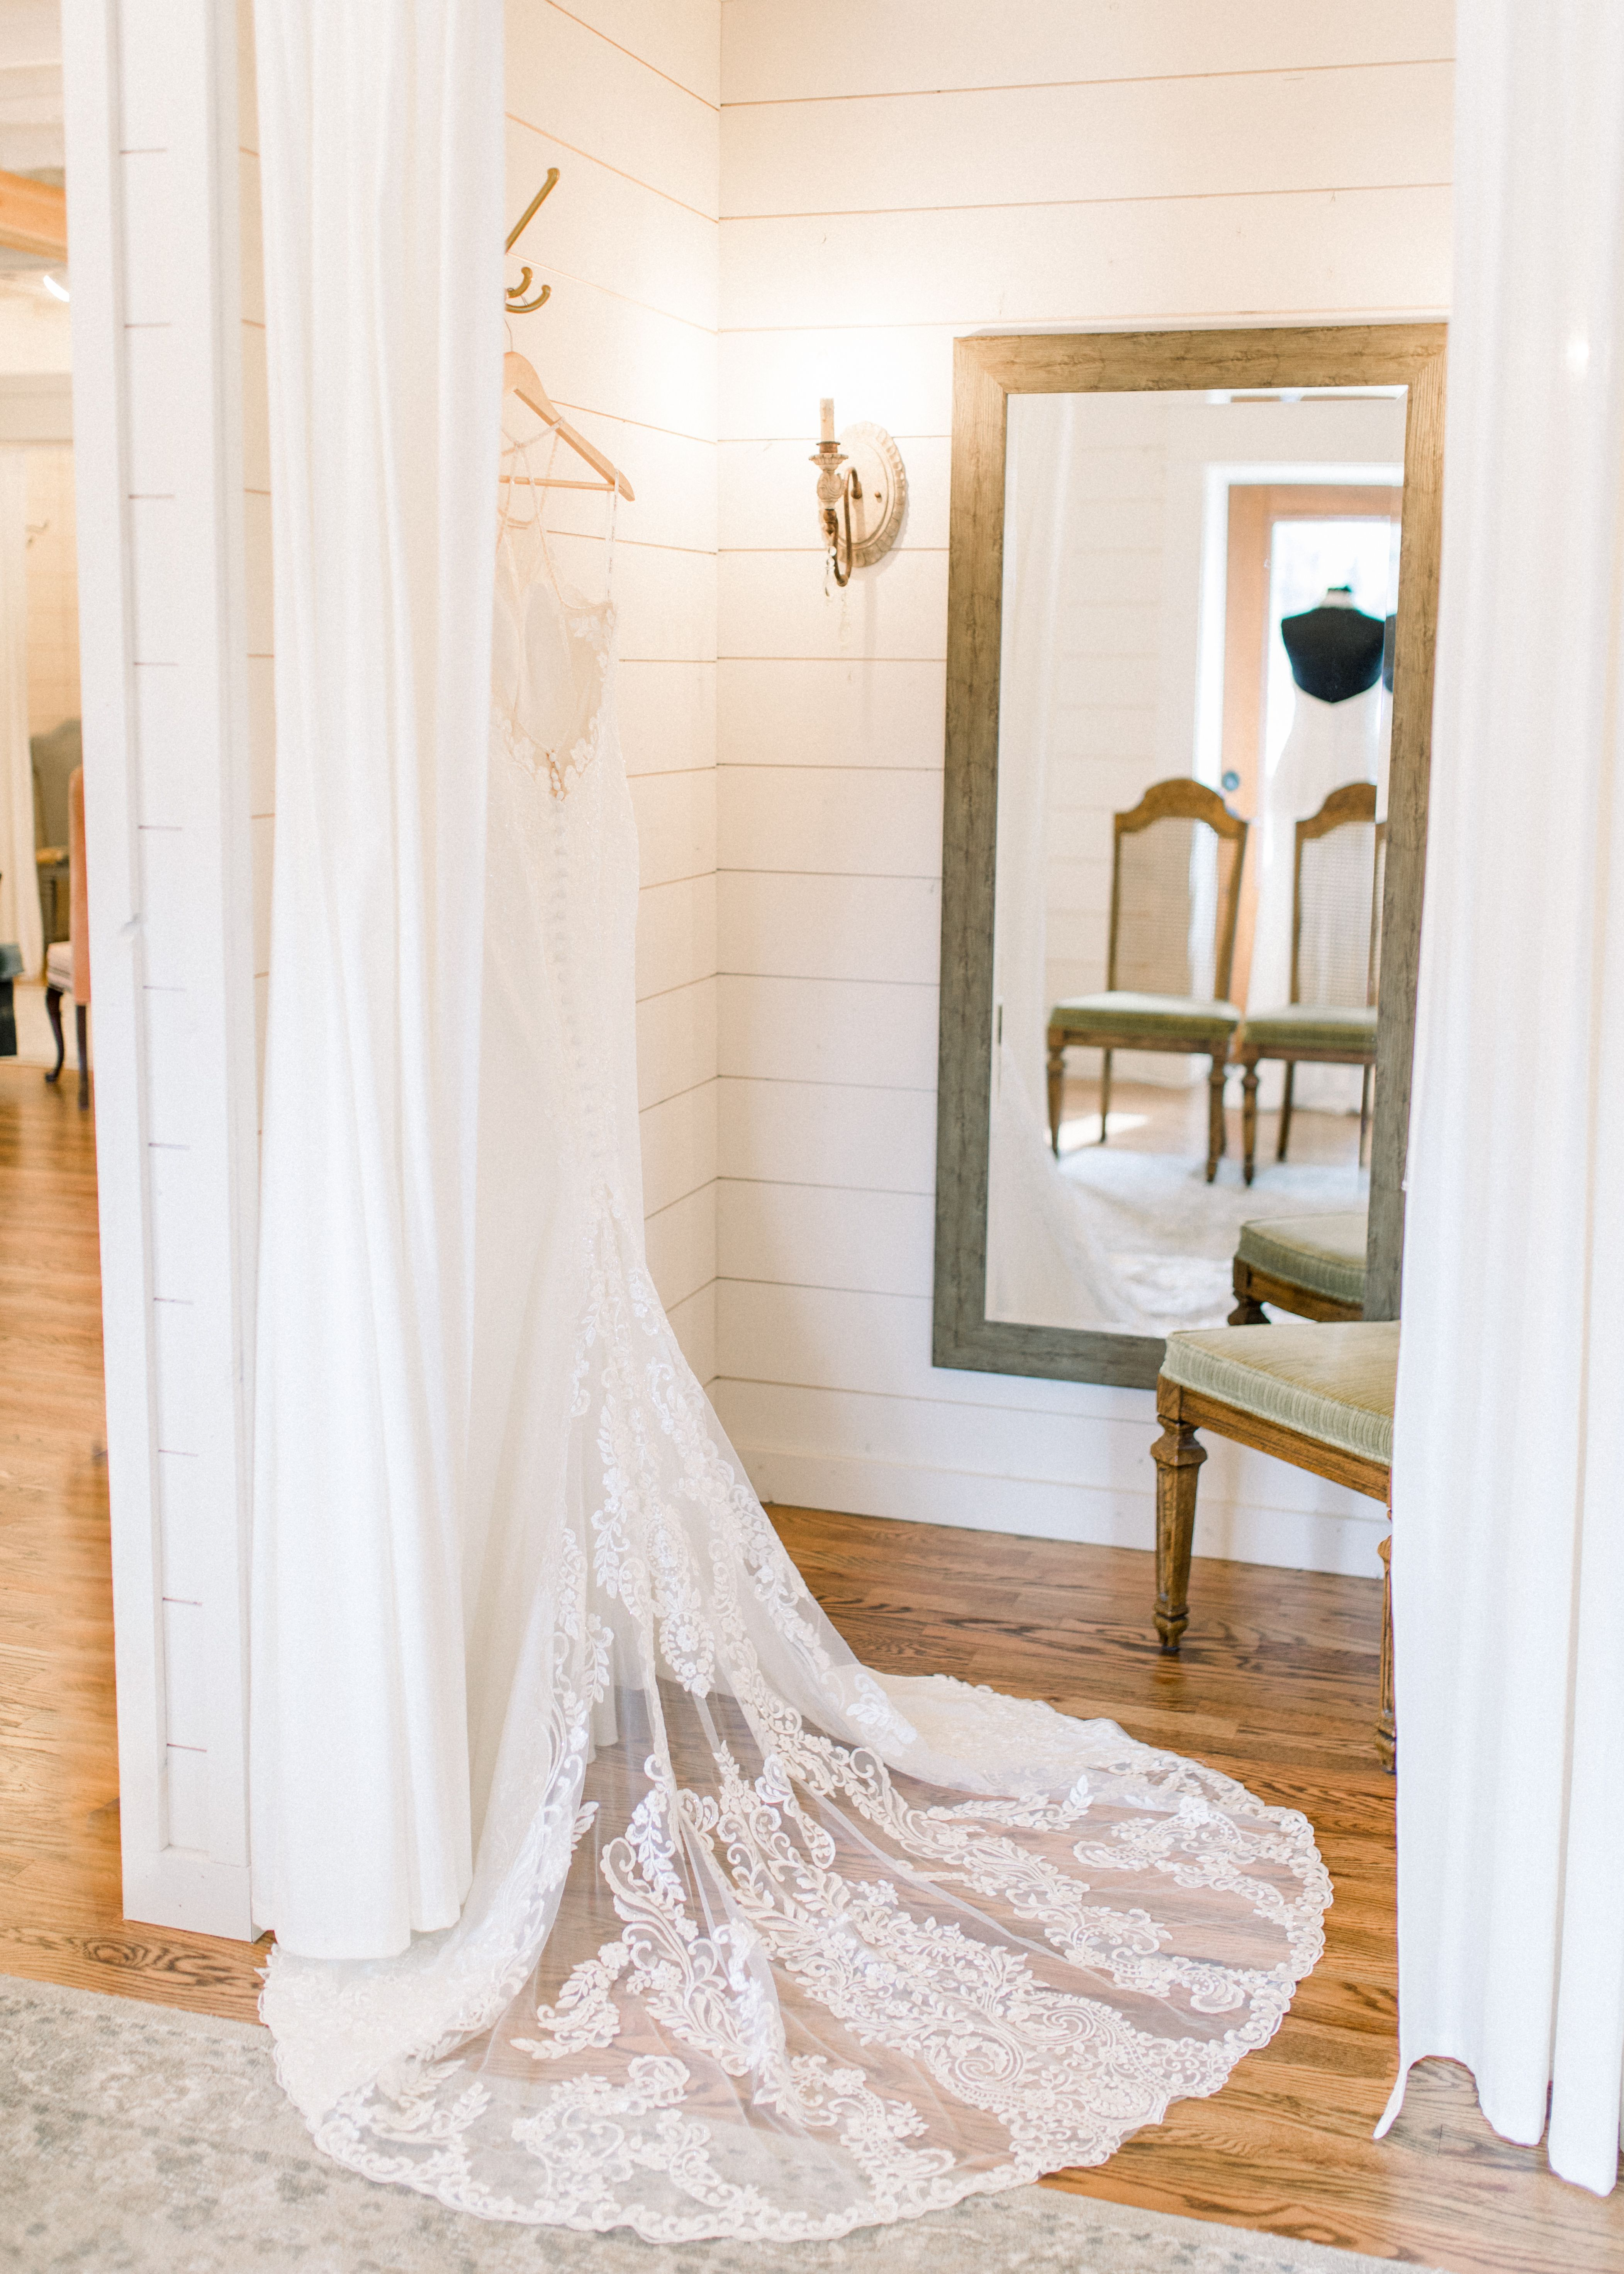 Cleo Bridal   Bridal Shop In O'Fallon, Missouri   Wedding dress ...